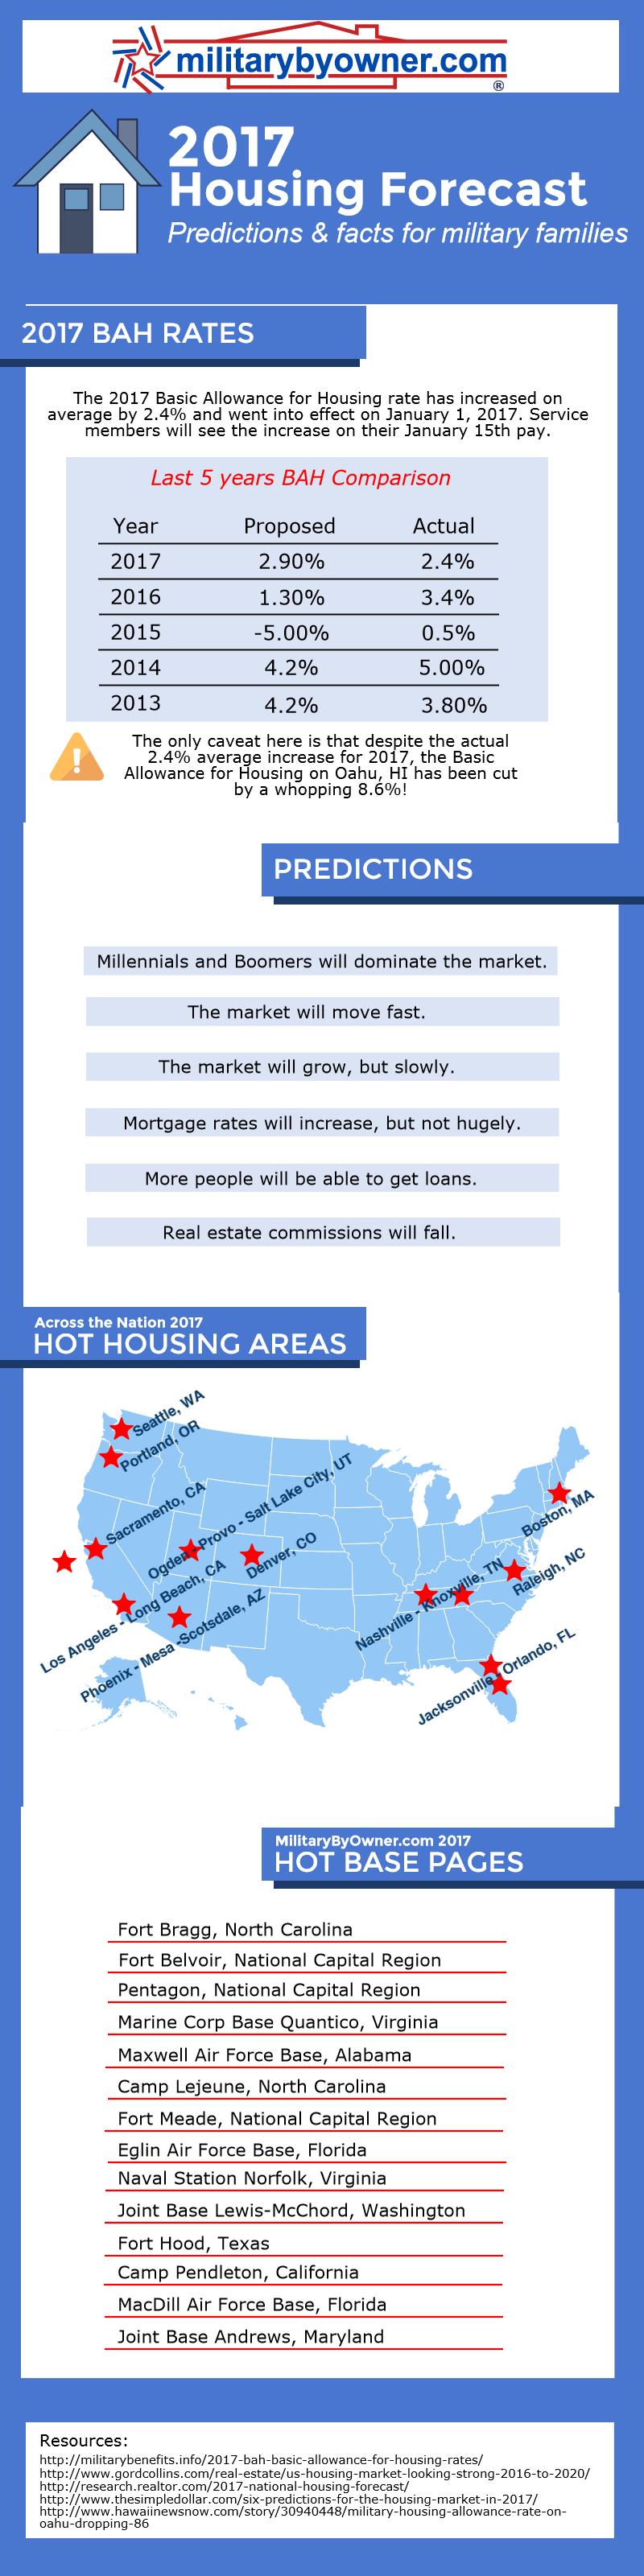 2017-housing-fo_19456309_594d7897e9ef9611c3901068bd8a99e6e15d3ea9.png